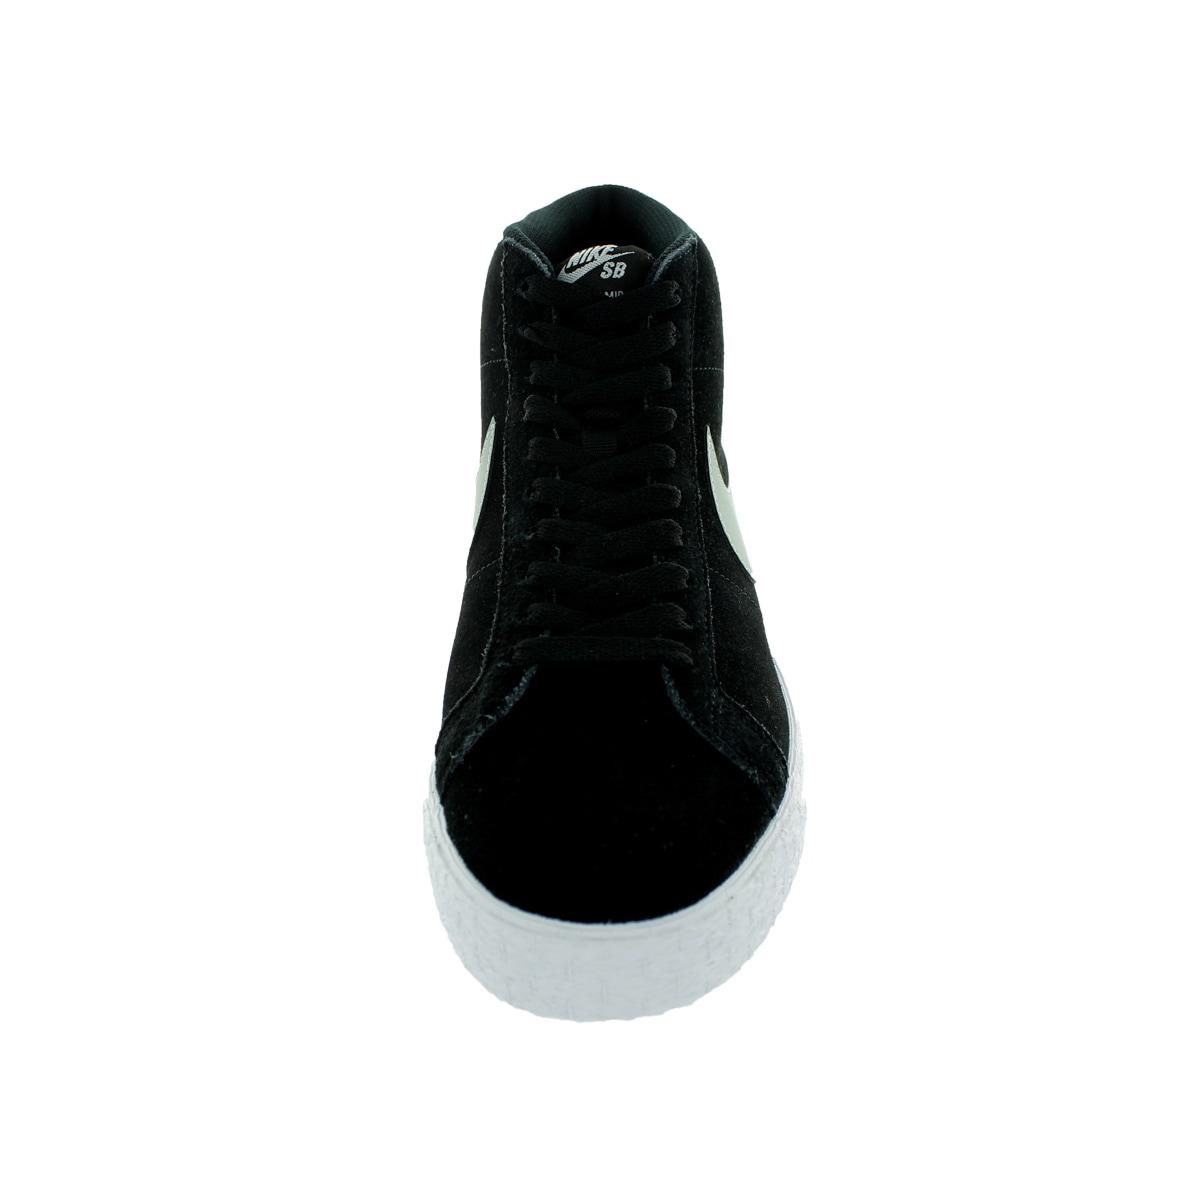 e9f687aa999d Shop Nike Men s Blazer SB Premium SE Base Grey Black White Skate Shoe -  Free Shipping Today - Overstock - 13394161